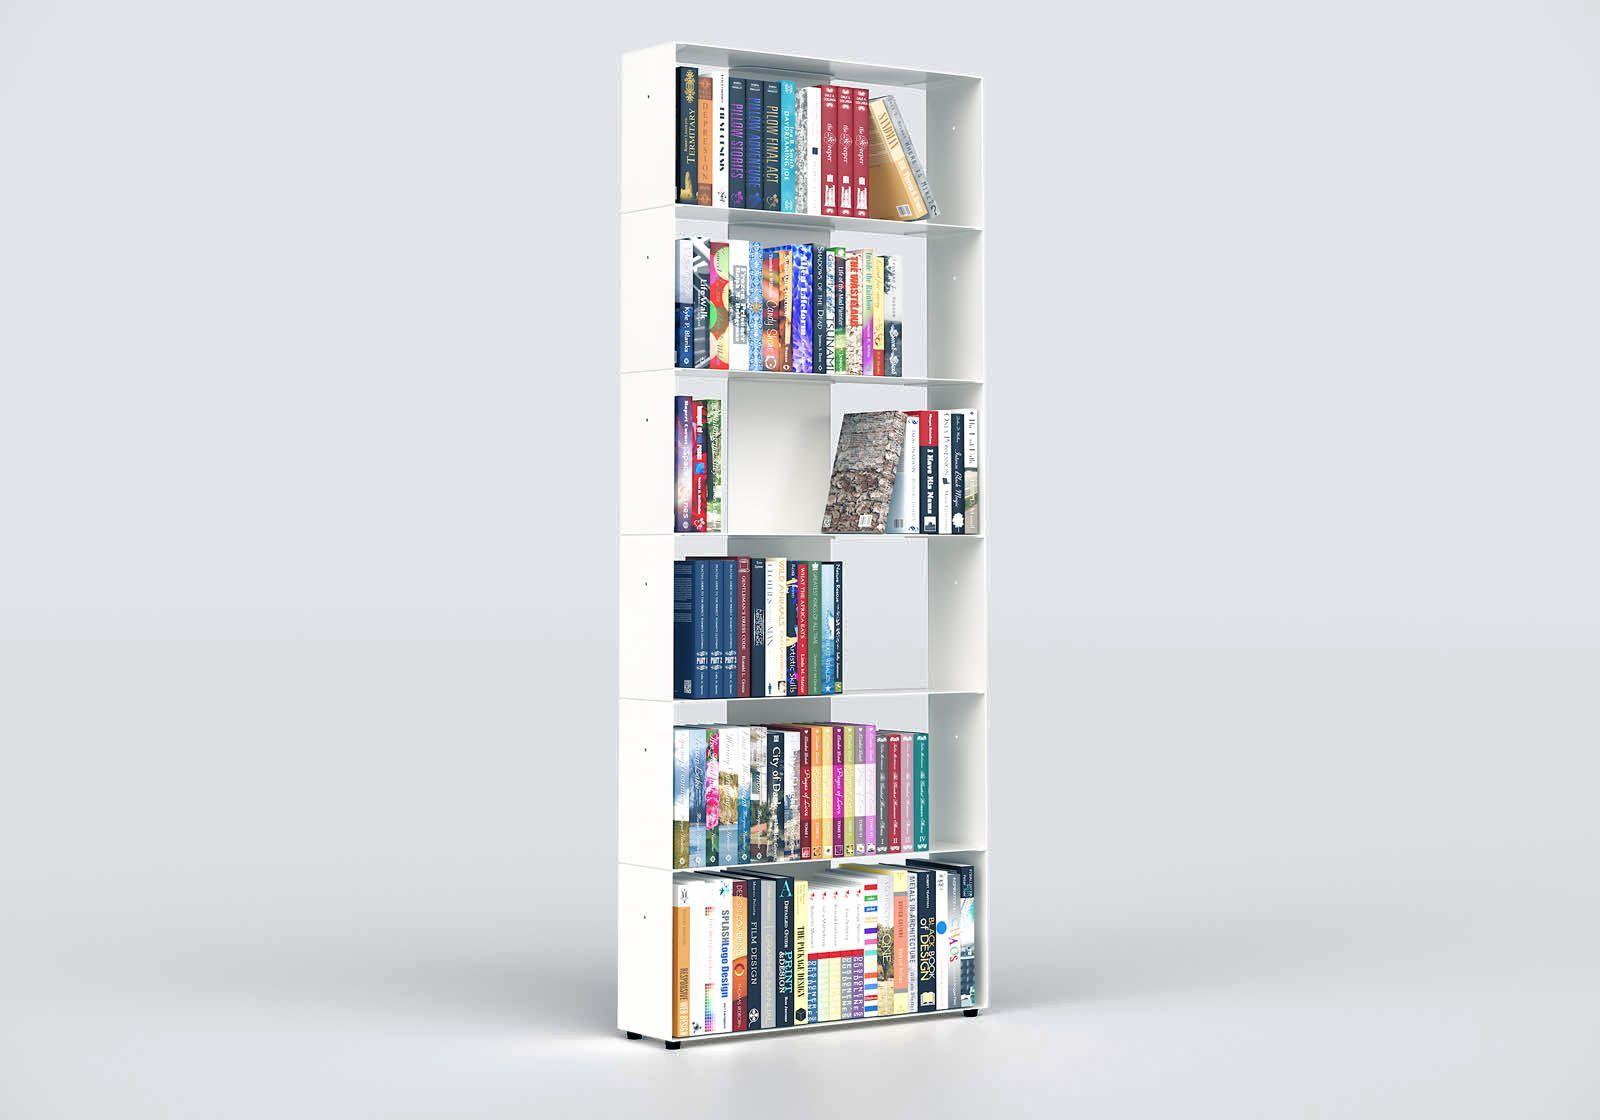 Narrow Bookshelf W60 H150 D15 cm - 6 shelves